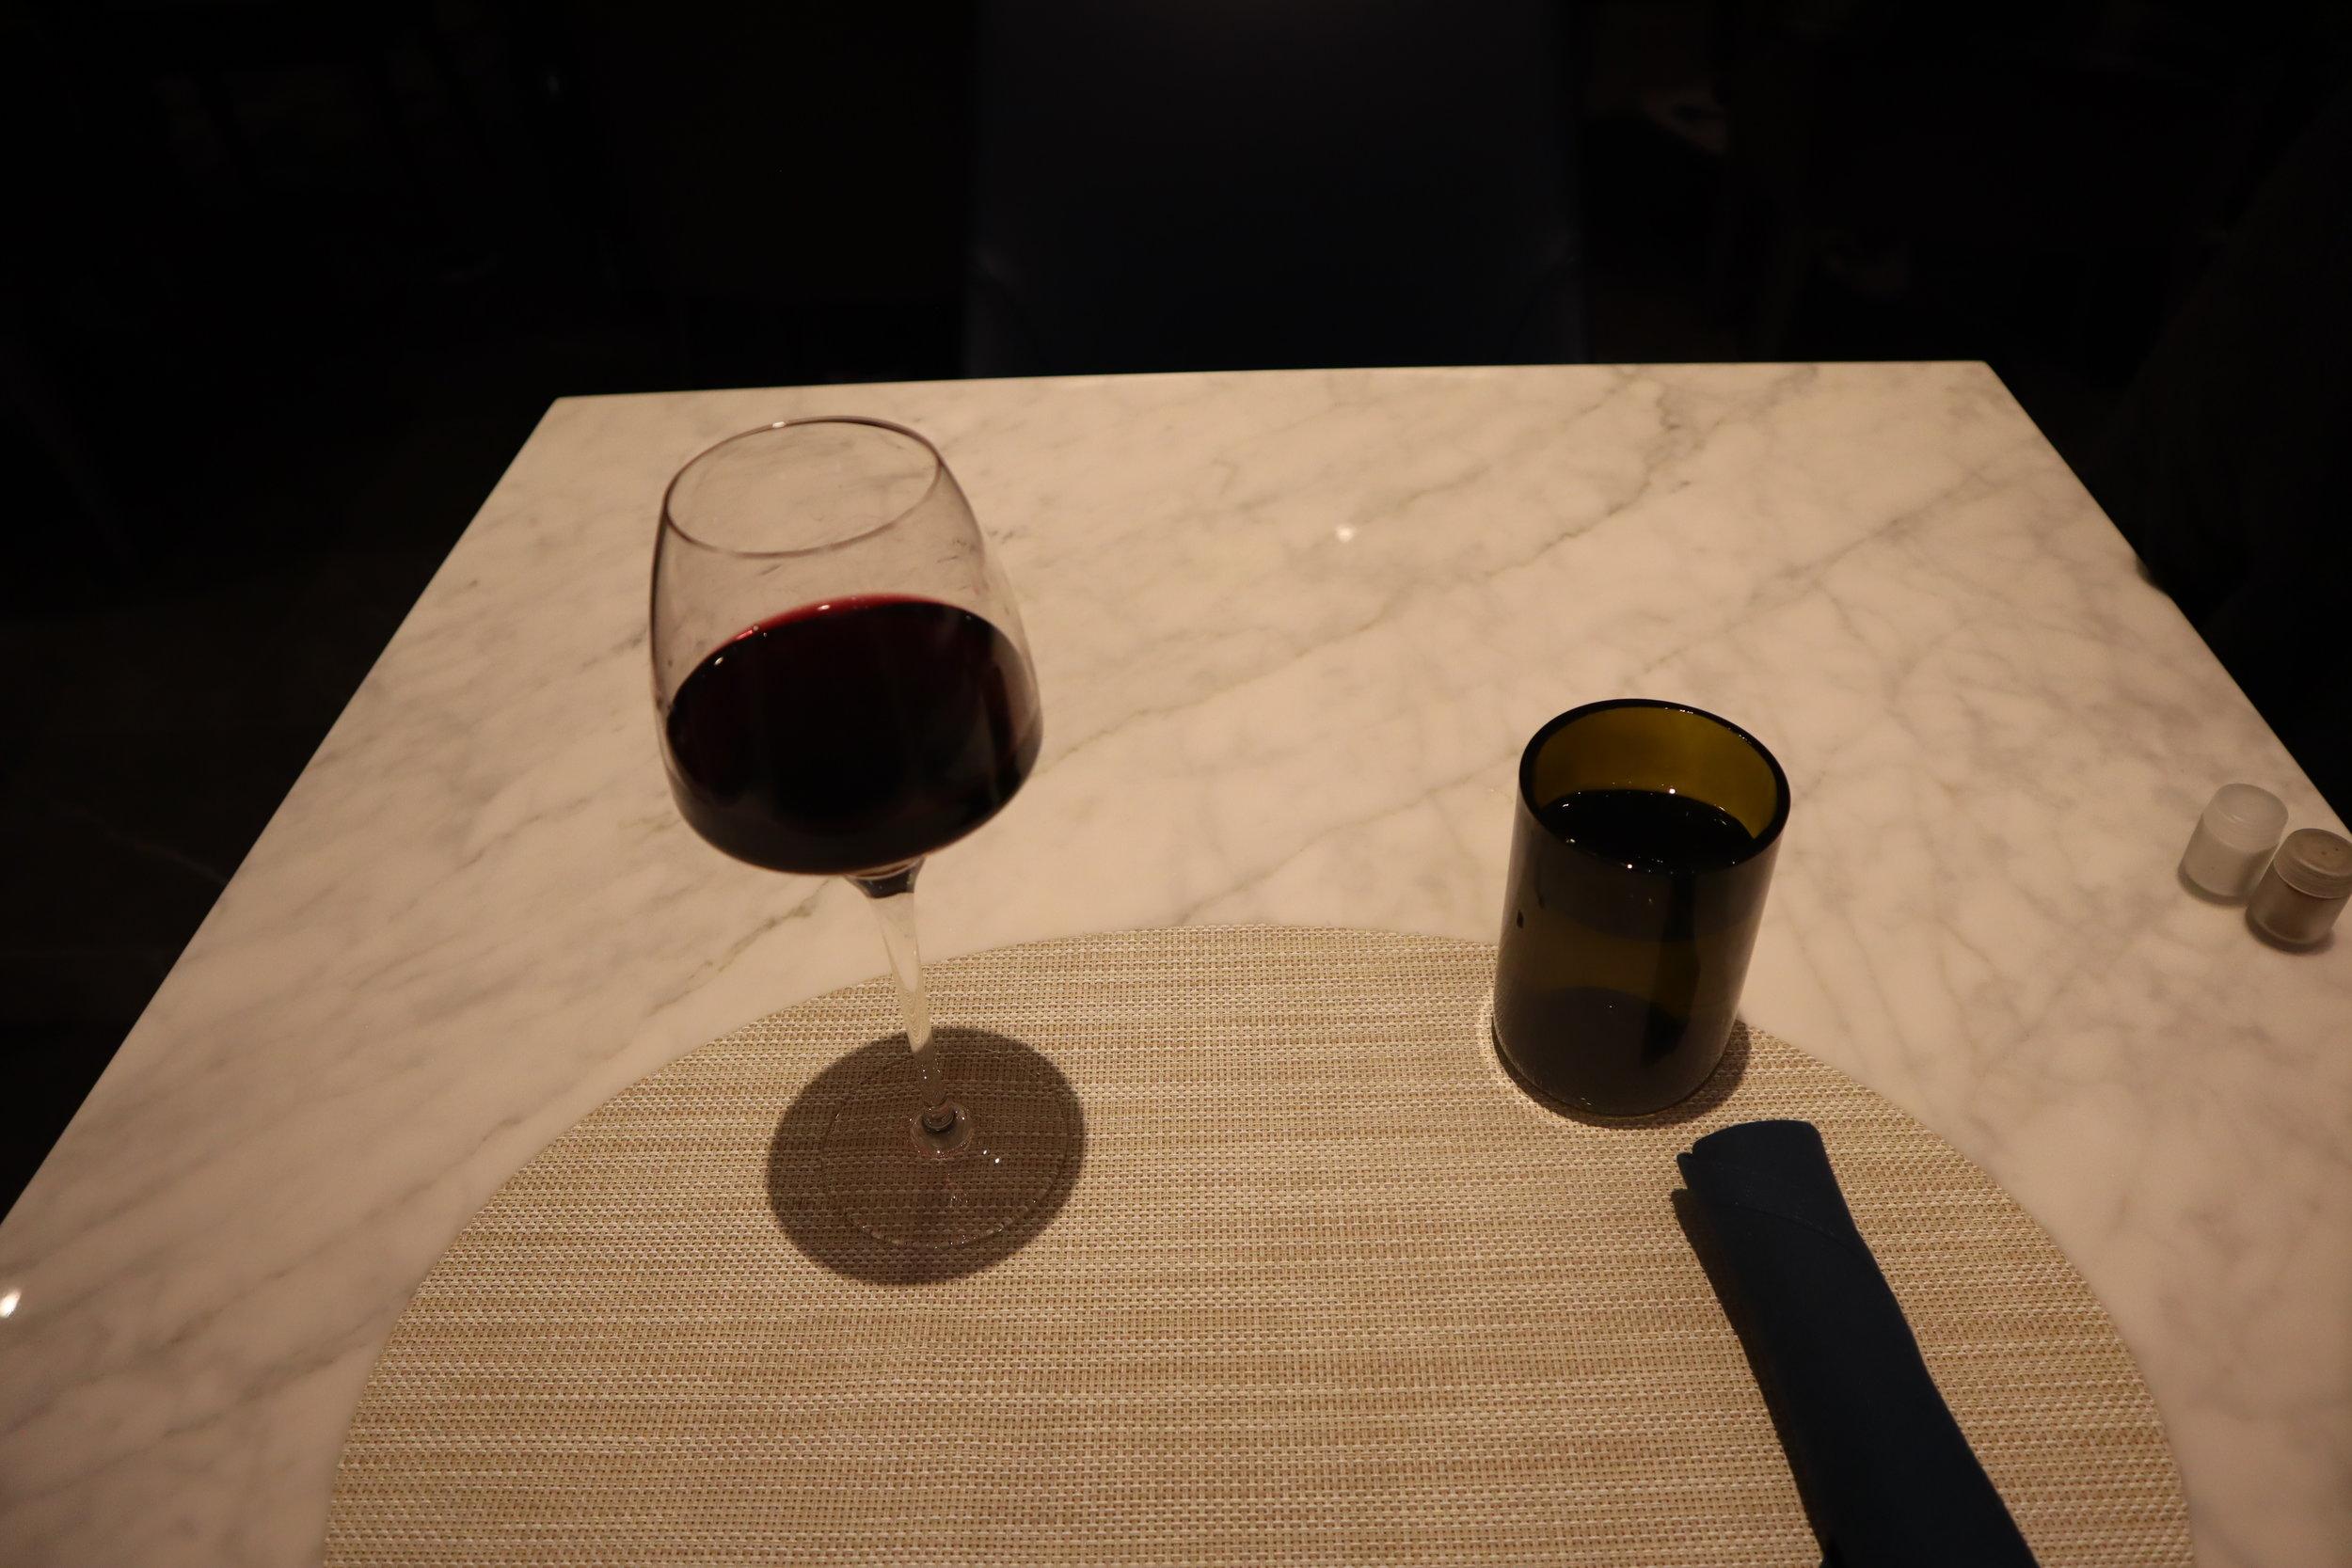 United Polaris Lounge Newark – Glass of Malbec